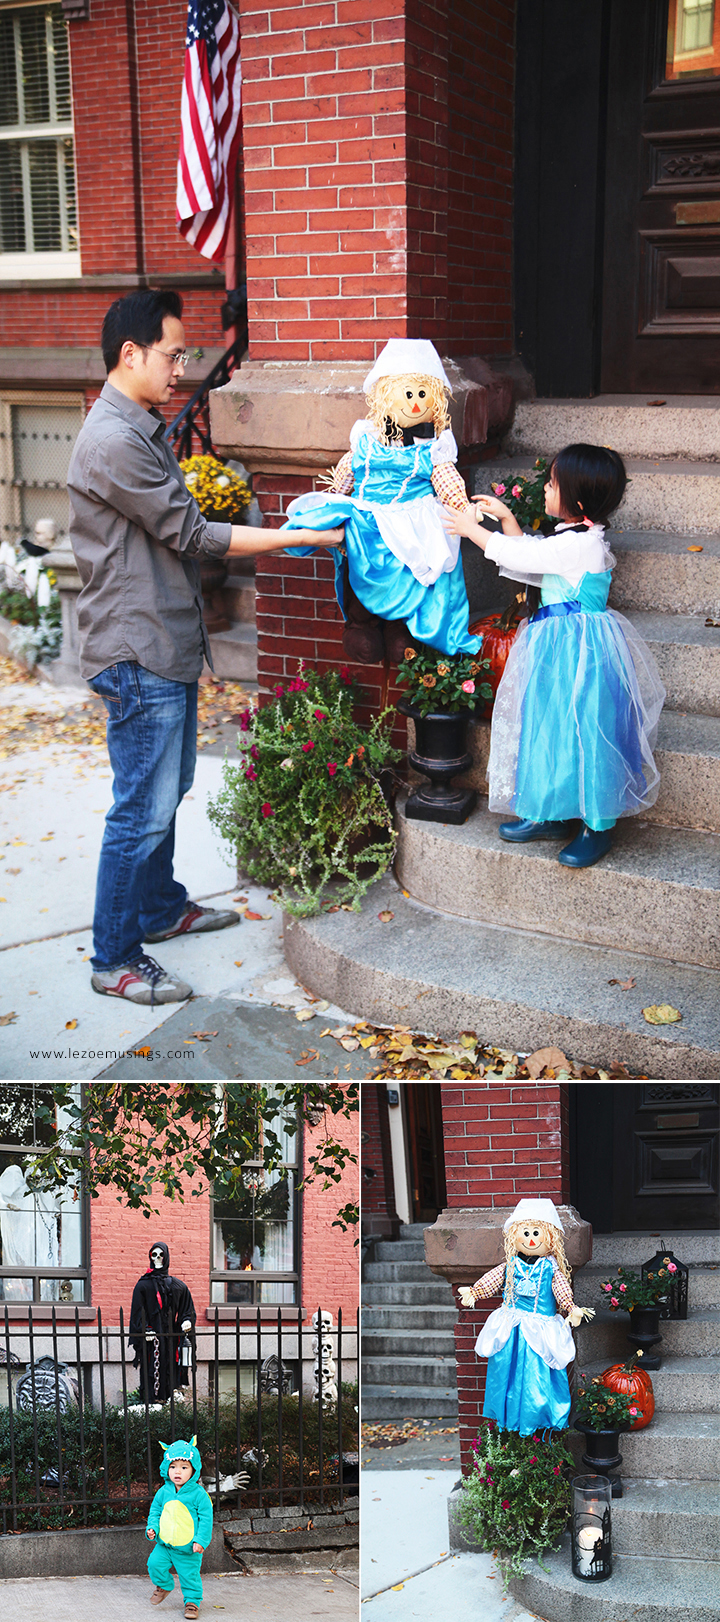 Halloween_Le Zoe Musings6